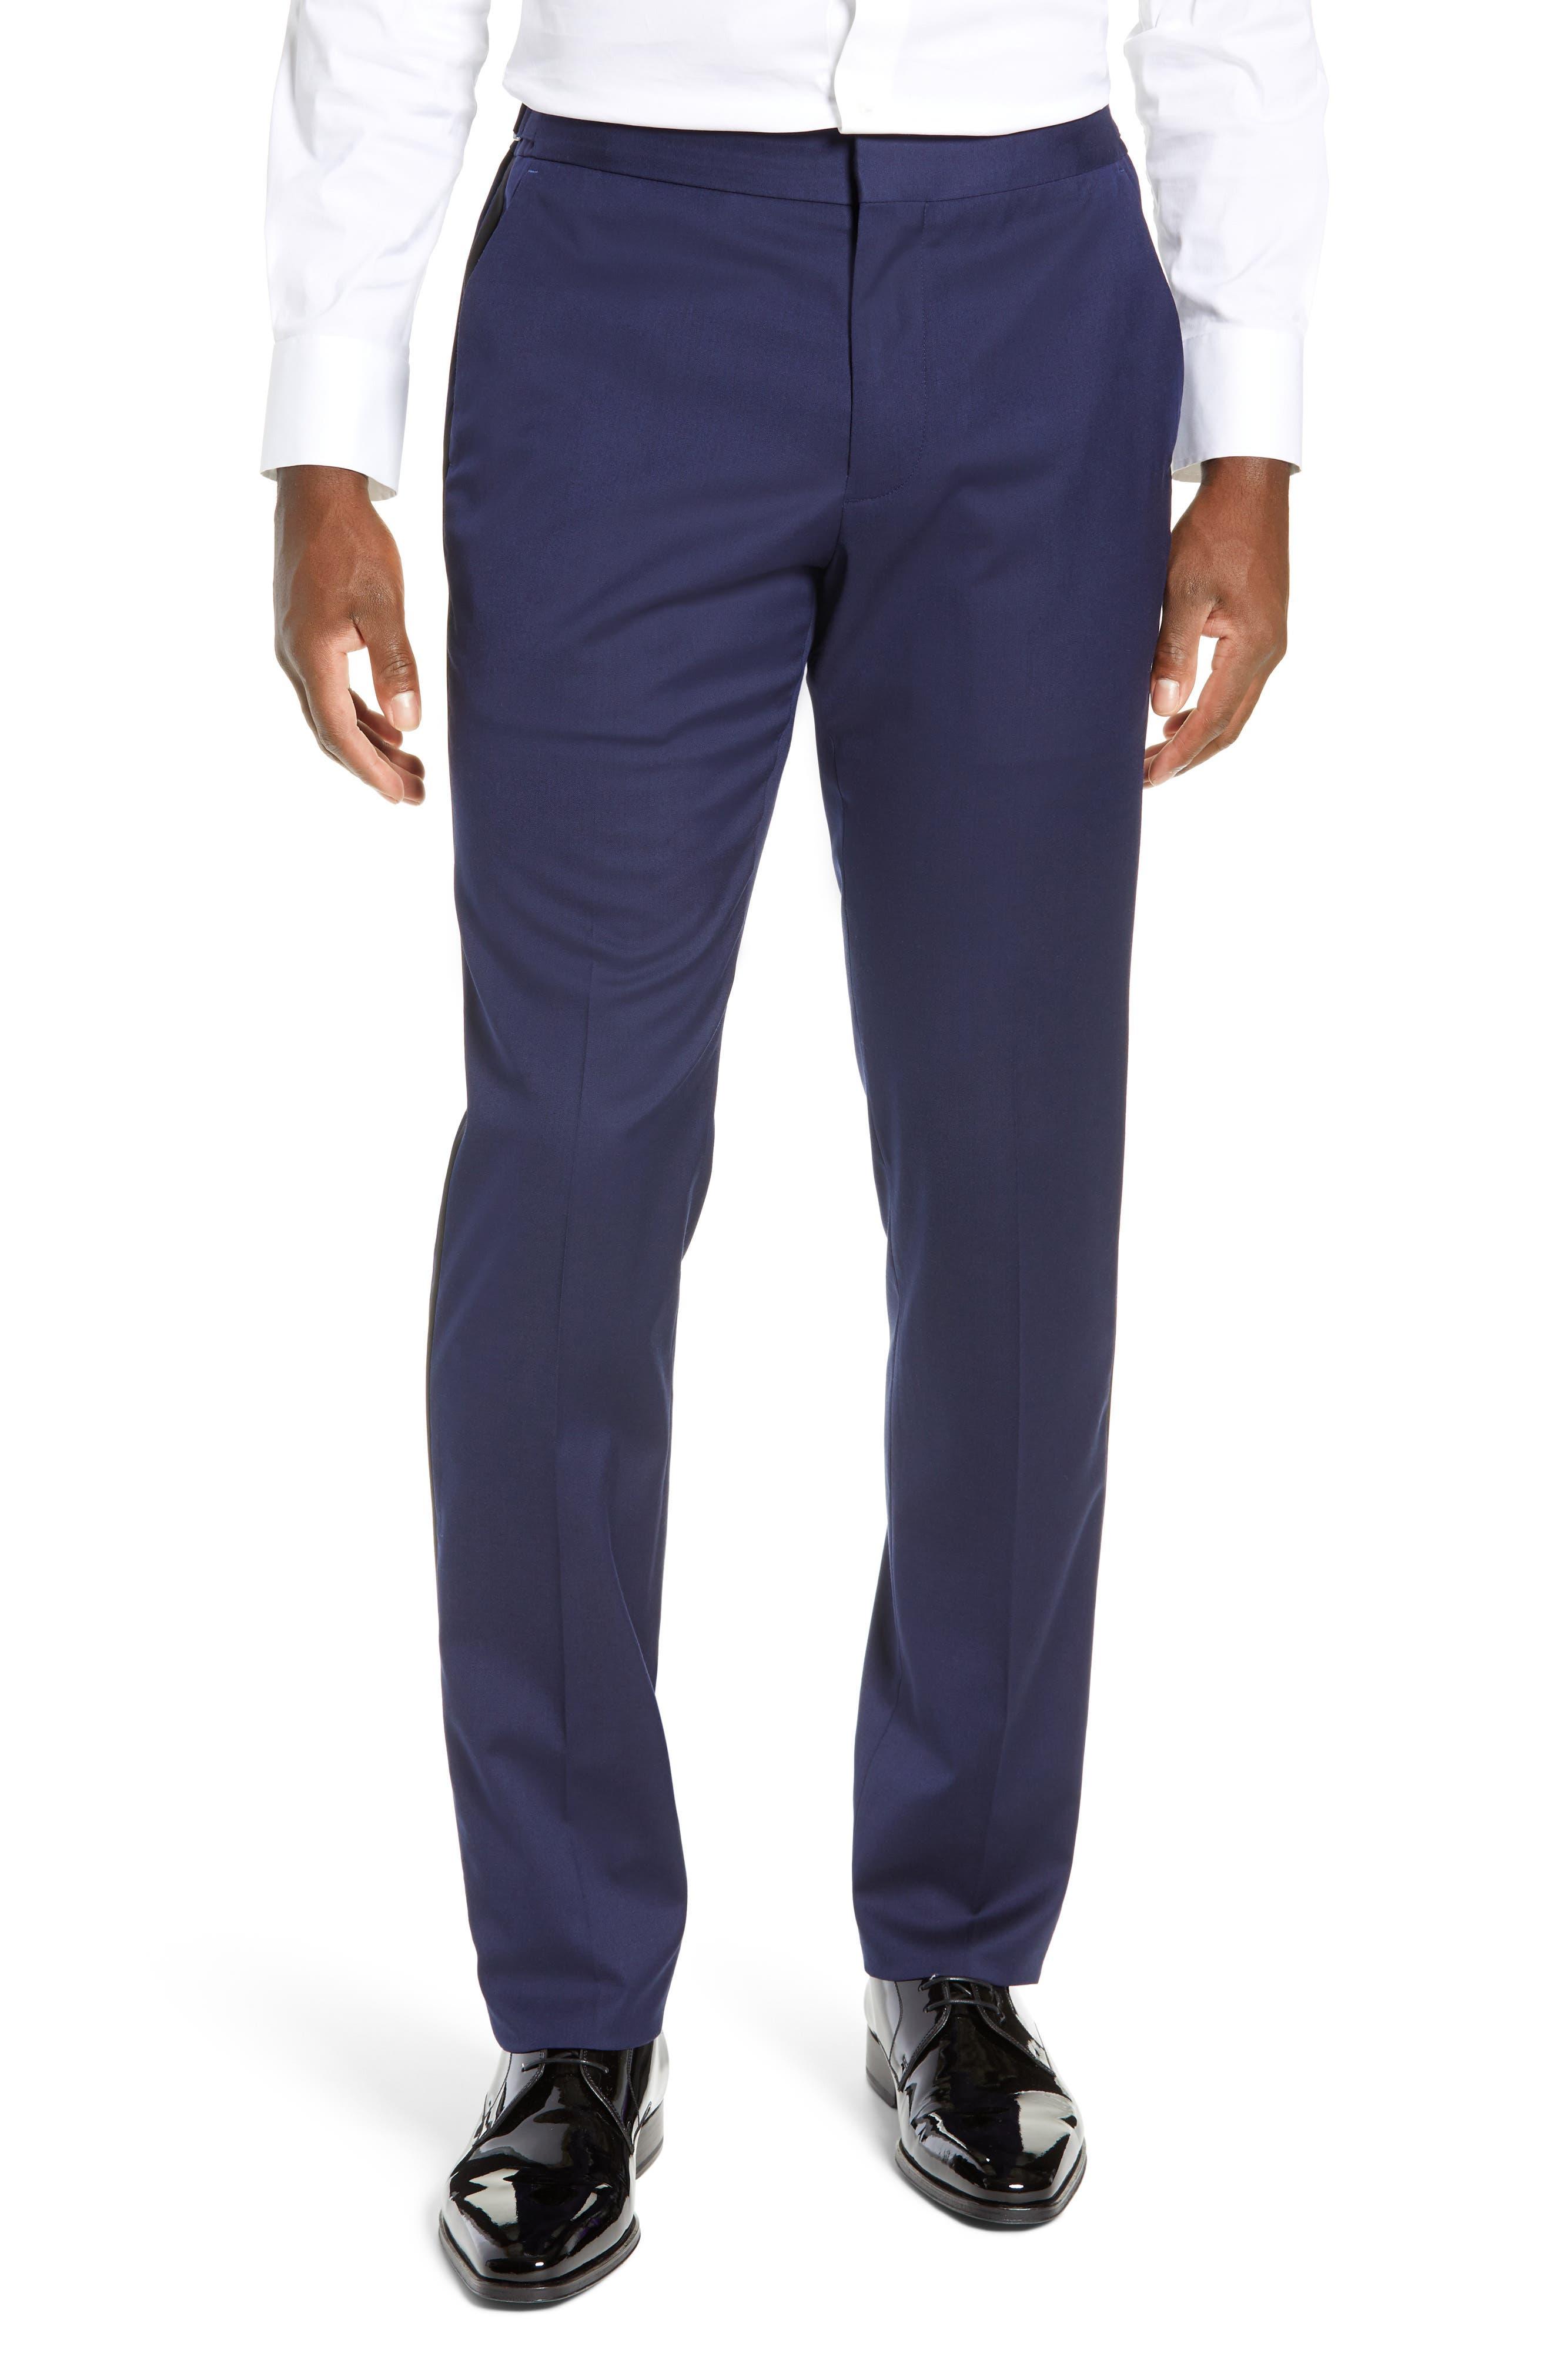 Capstone Slim Fit Tuxedo Trousers,                         Main,                         color, NAVY